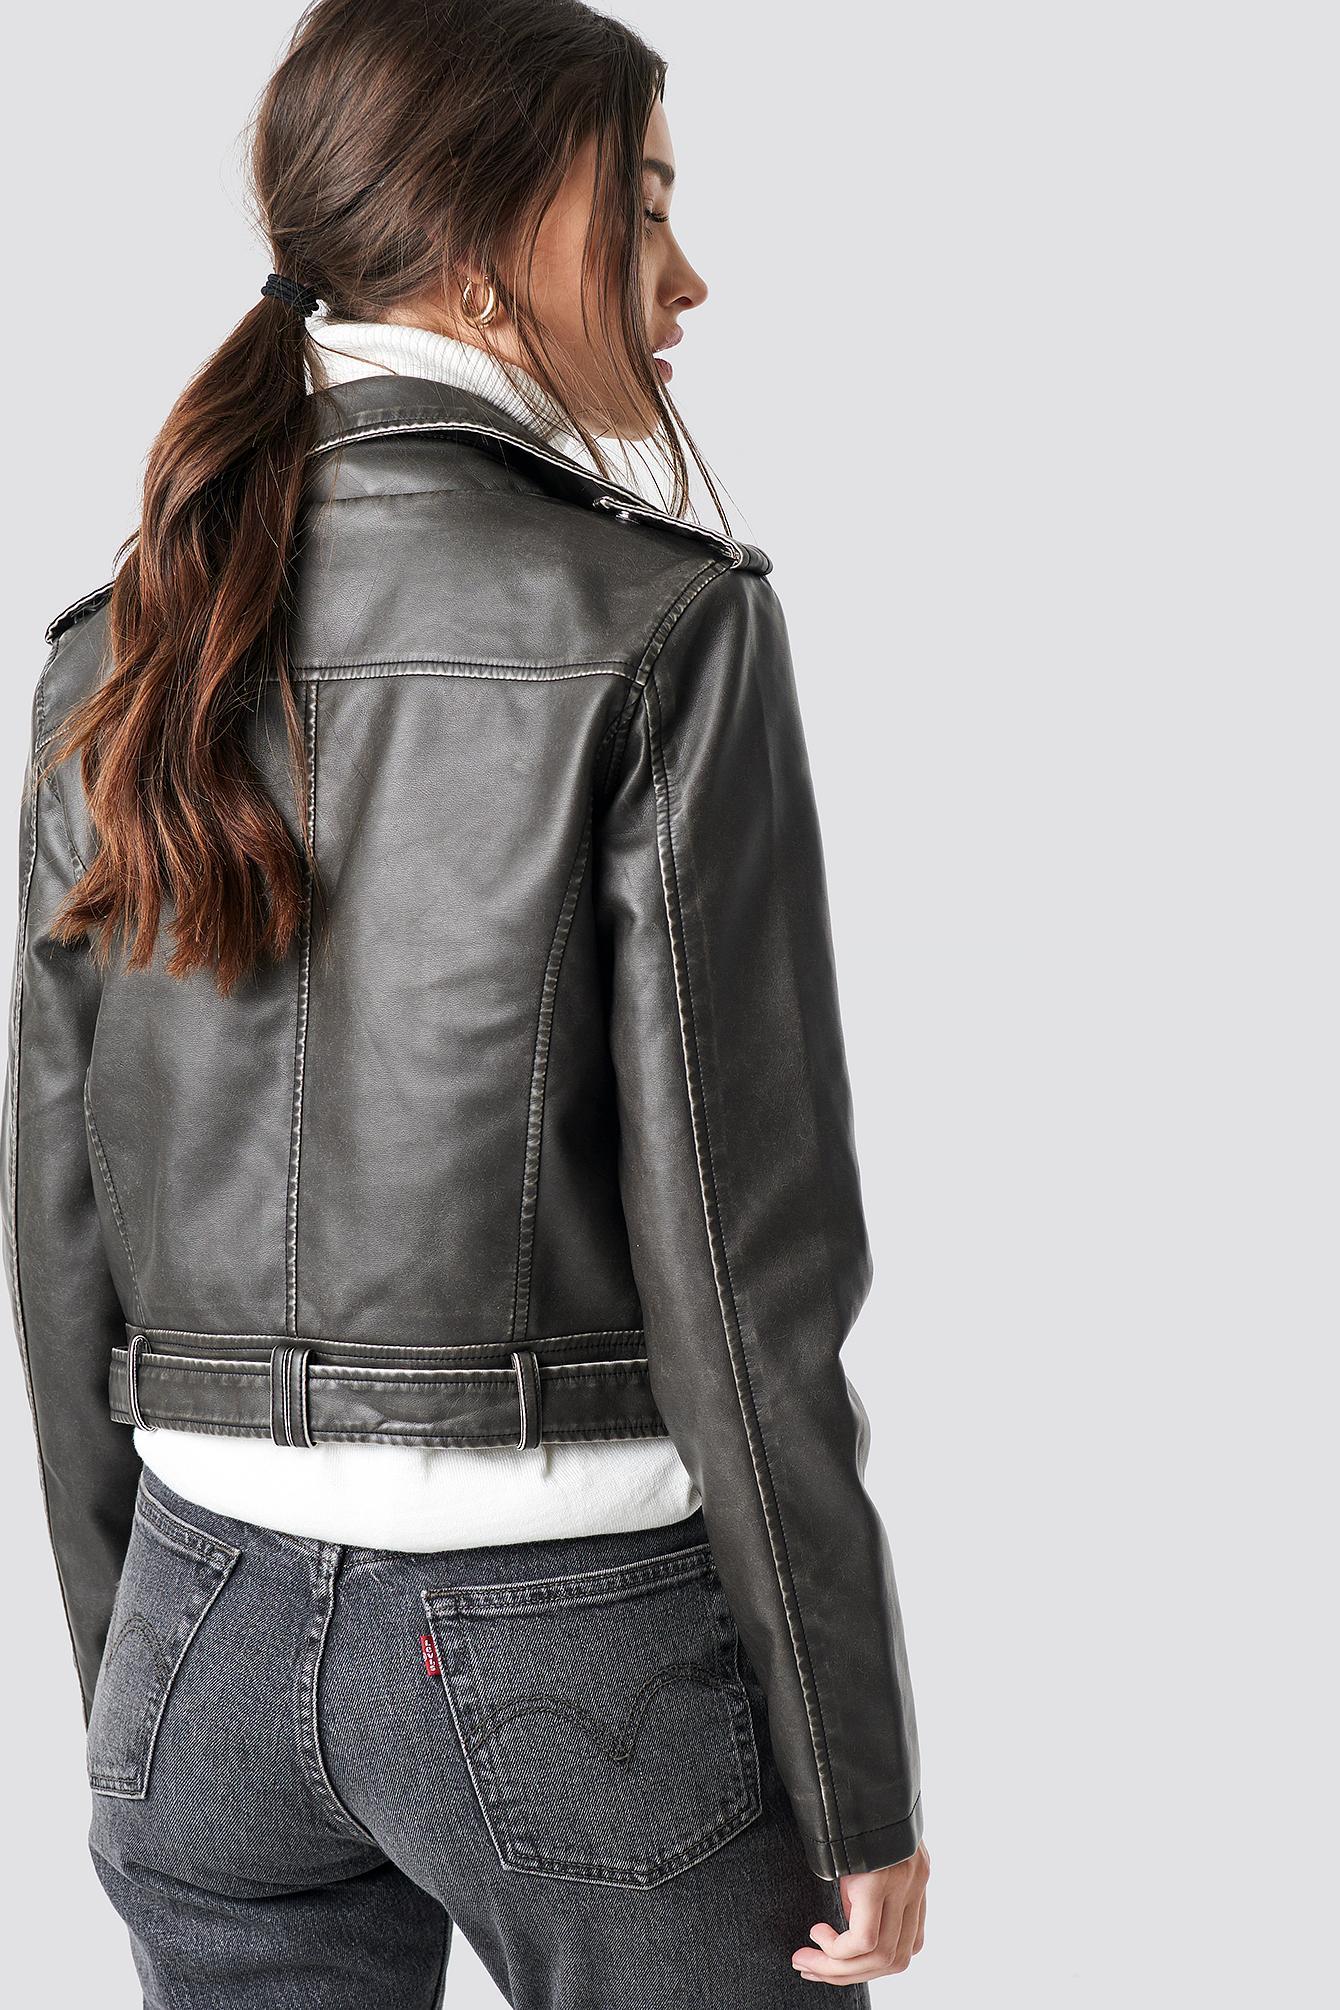 NA-KD Pu Leather Biker Jacket White - Lyst